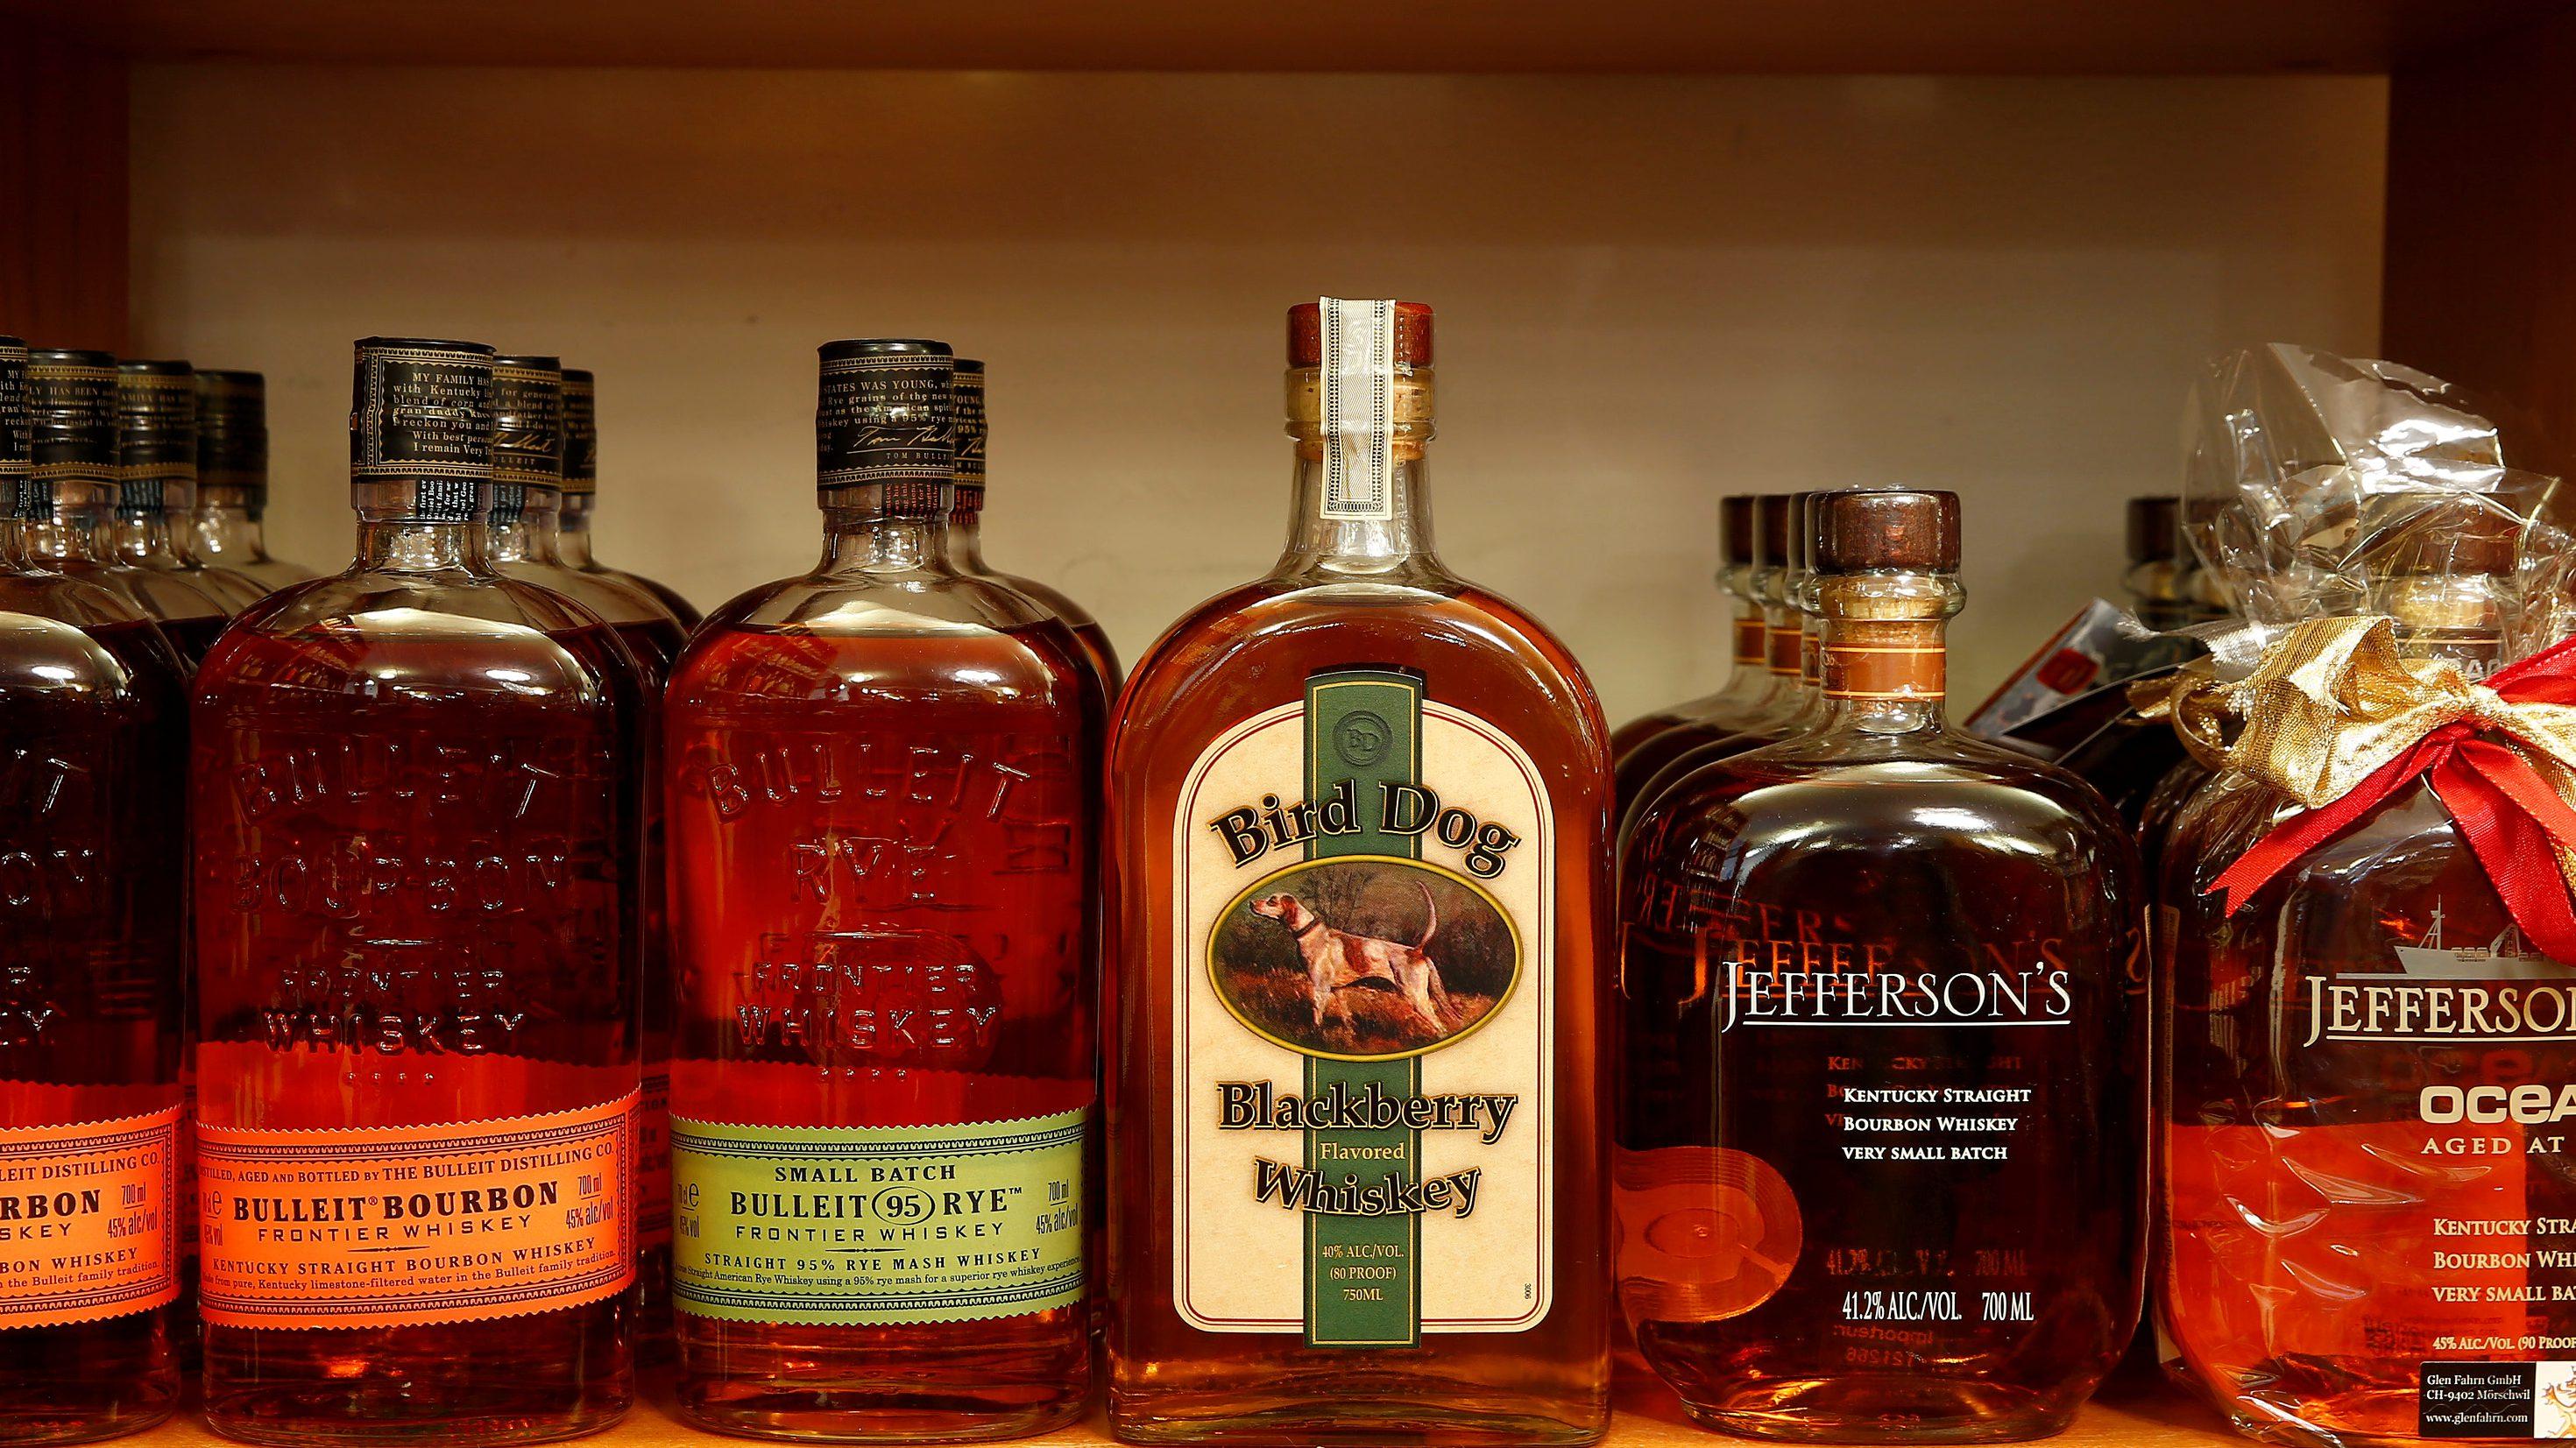 Bottles of rye and bourbon whiskey of distilleries from the U.S. are offered at Glen Fahrn liquor store in Zurich, Switzerland June 7, 2016.    REUTERS/Arnd Wiegmann - D1AETMMROGAA